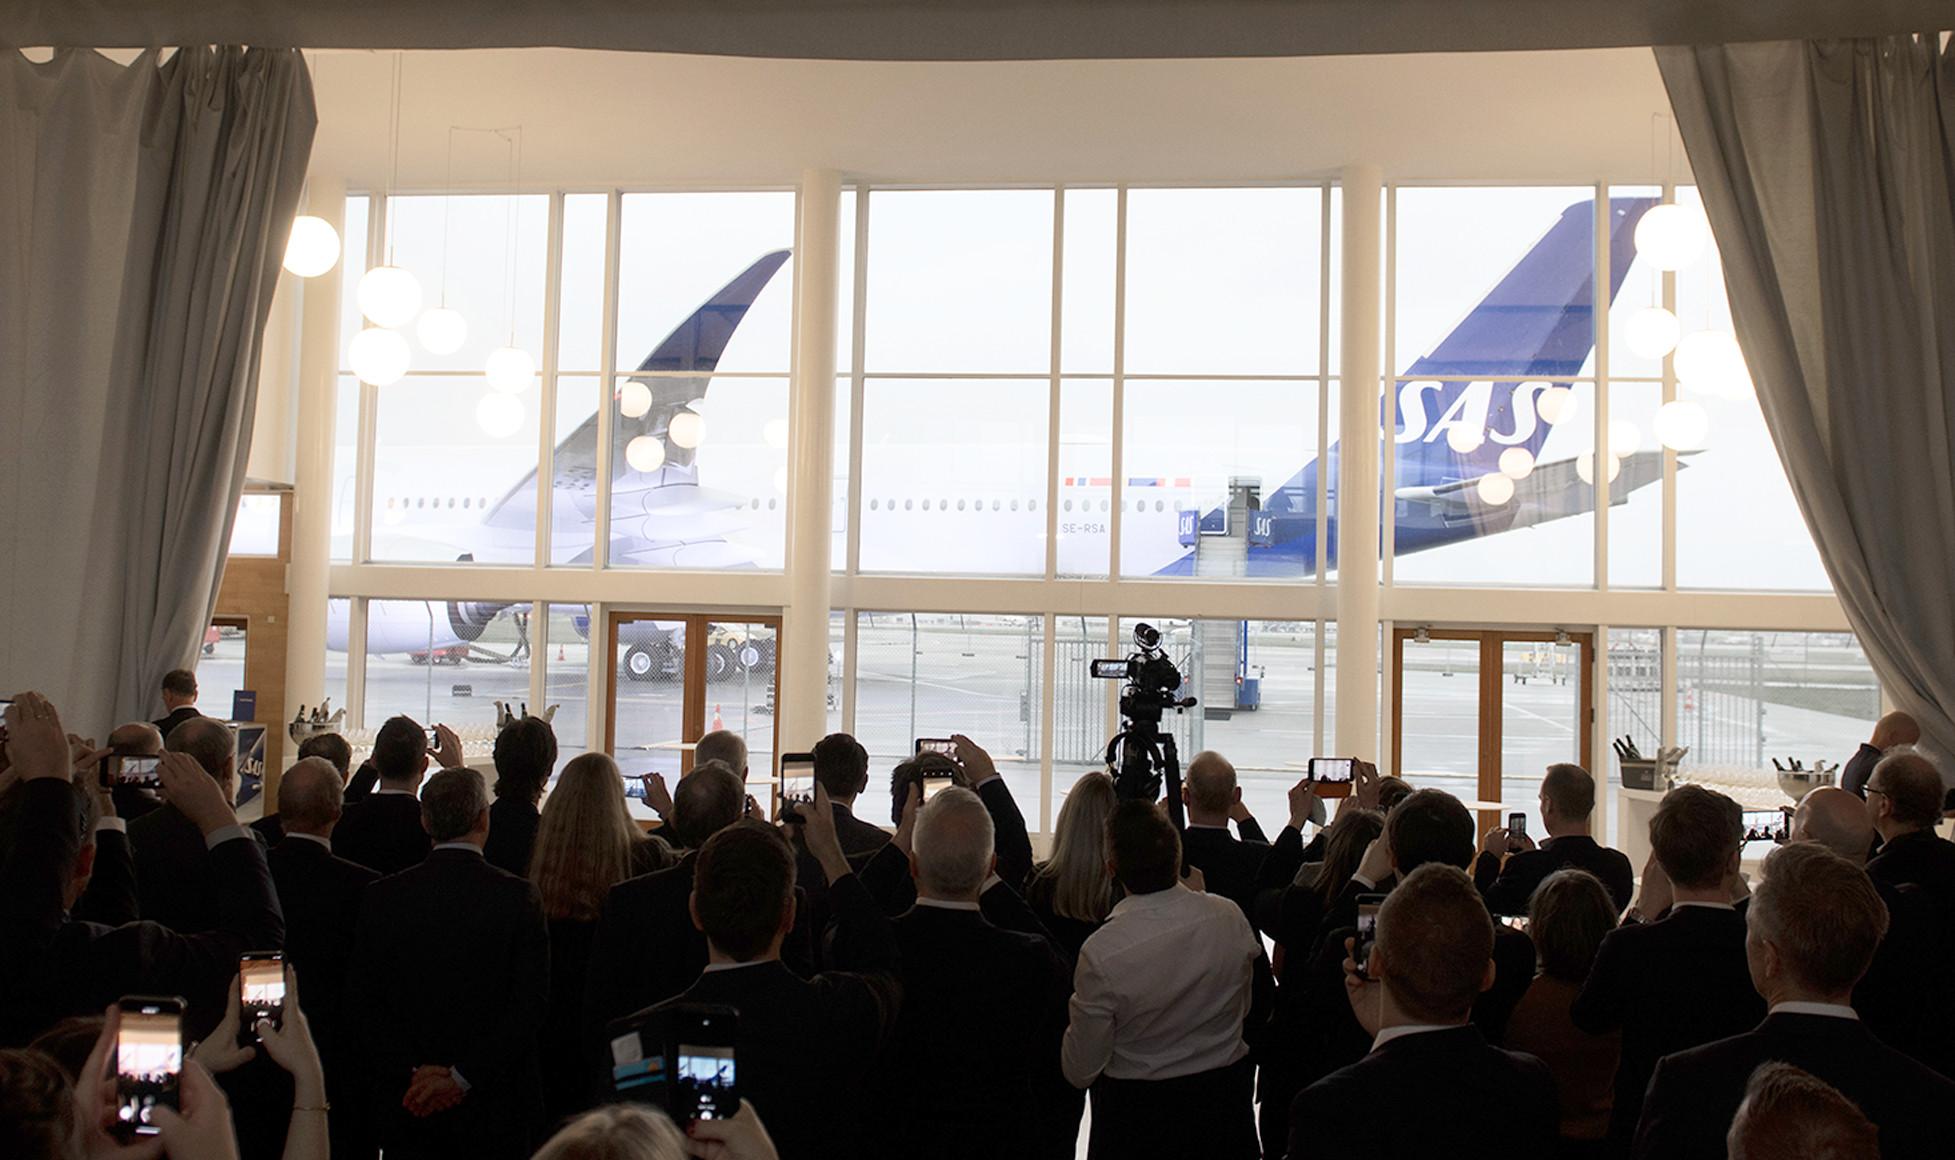 A350-8-Col_1955x1160_CPH_lancering